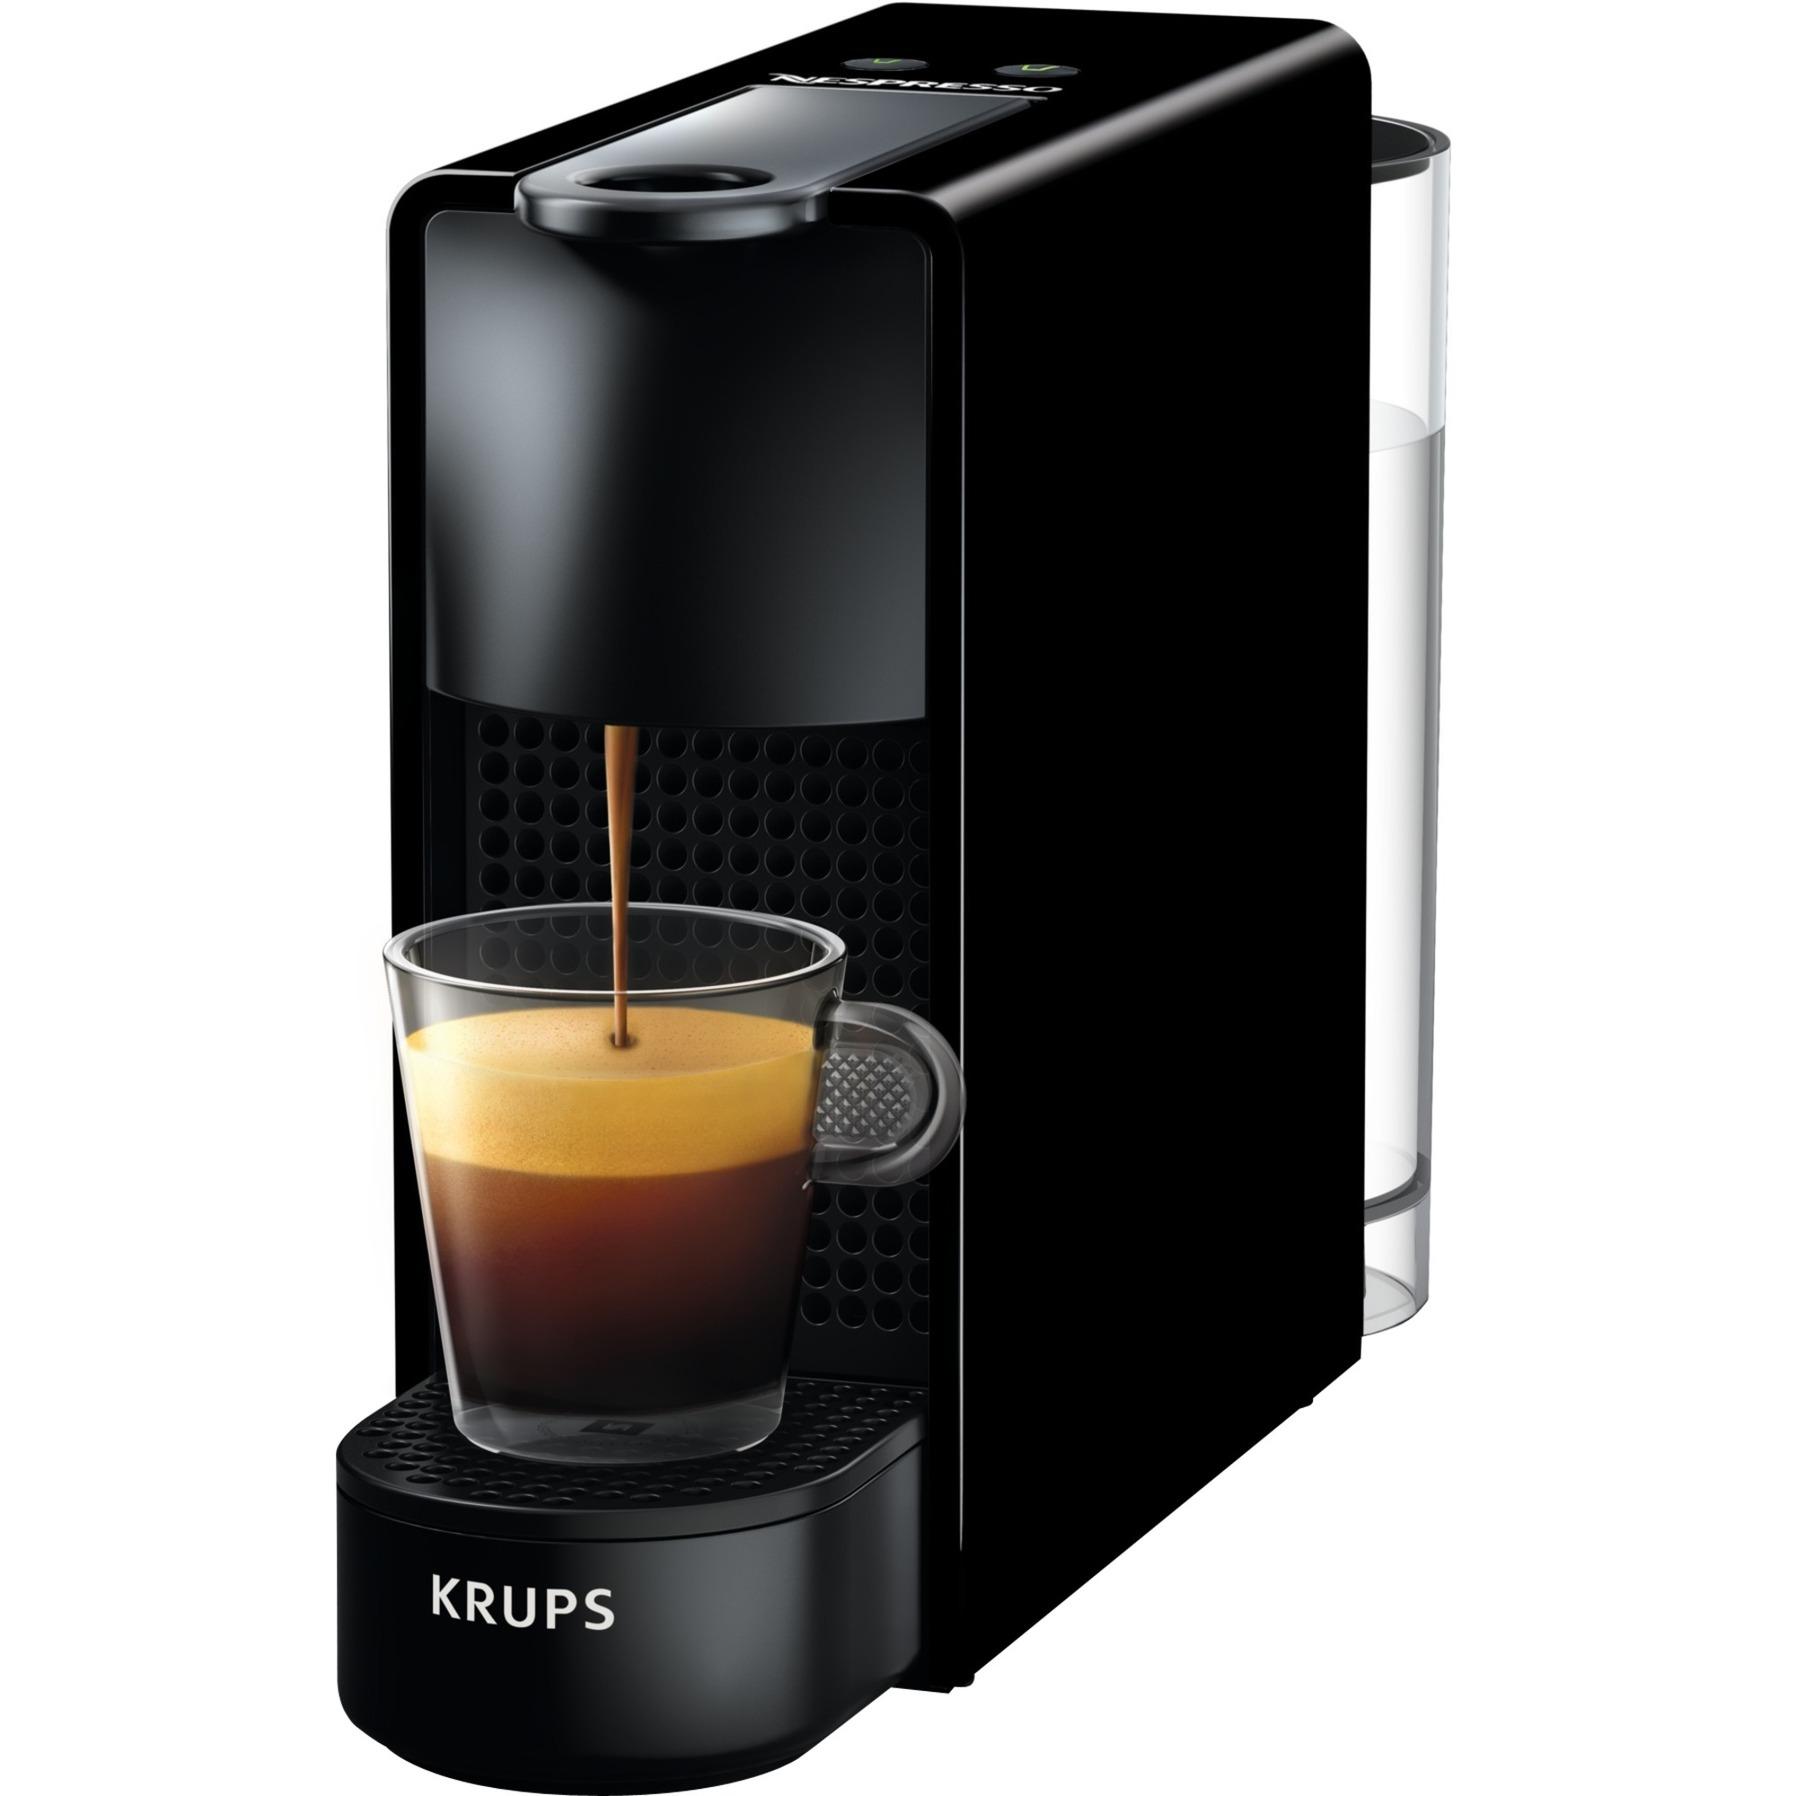 Essenza Mini XN110810 Independiente Manual Máquina de café en cápsulas 0.6L 1tazas Negro, Cafetera de cápsulas